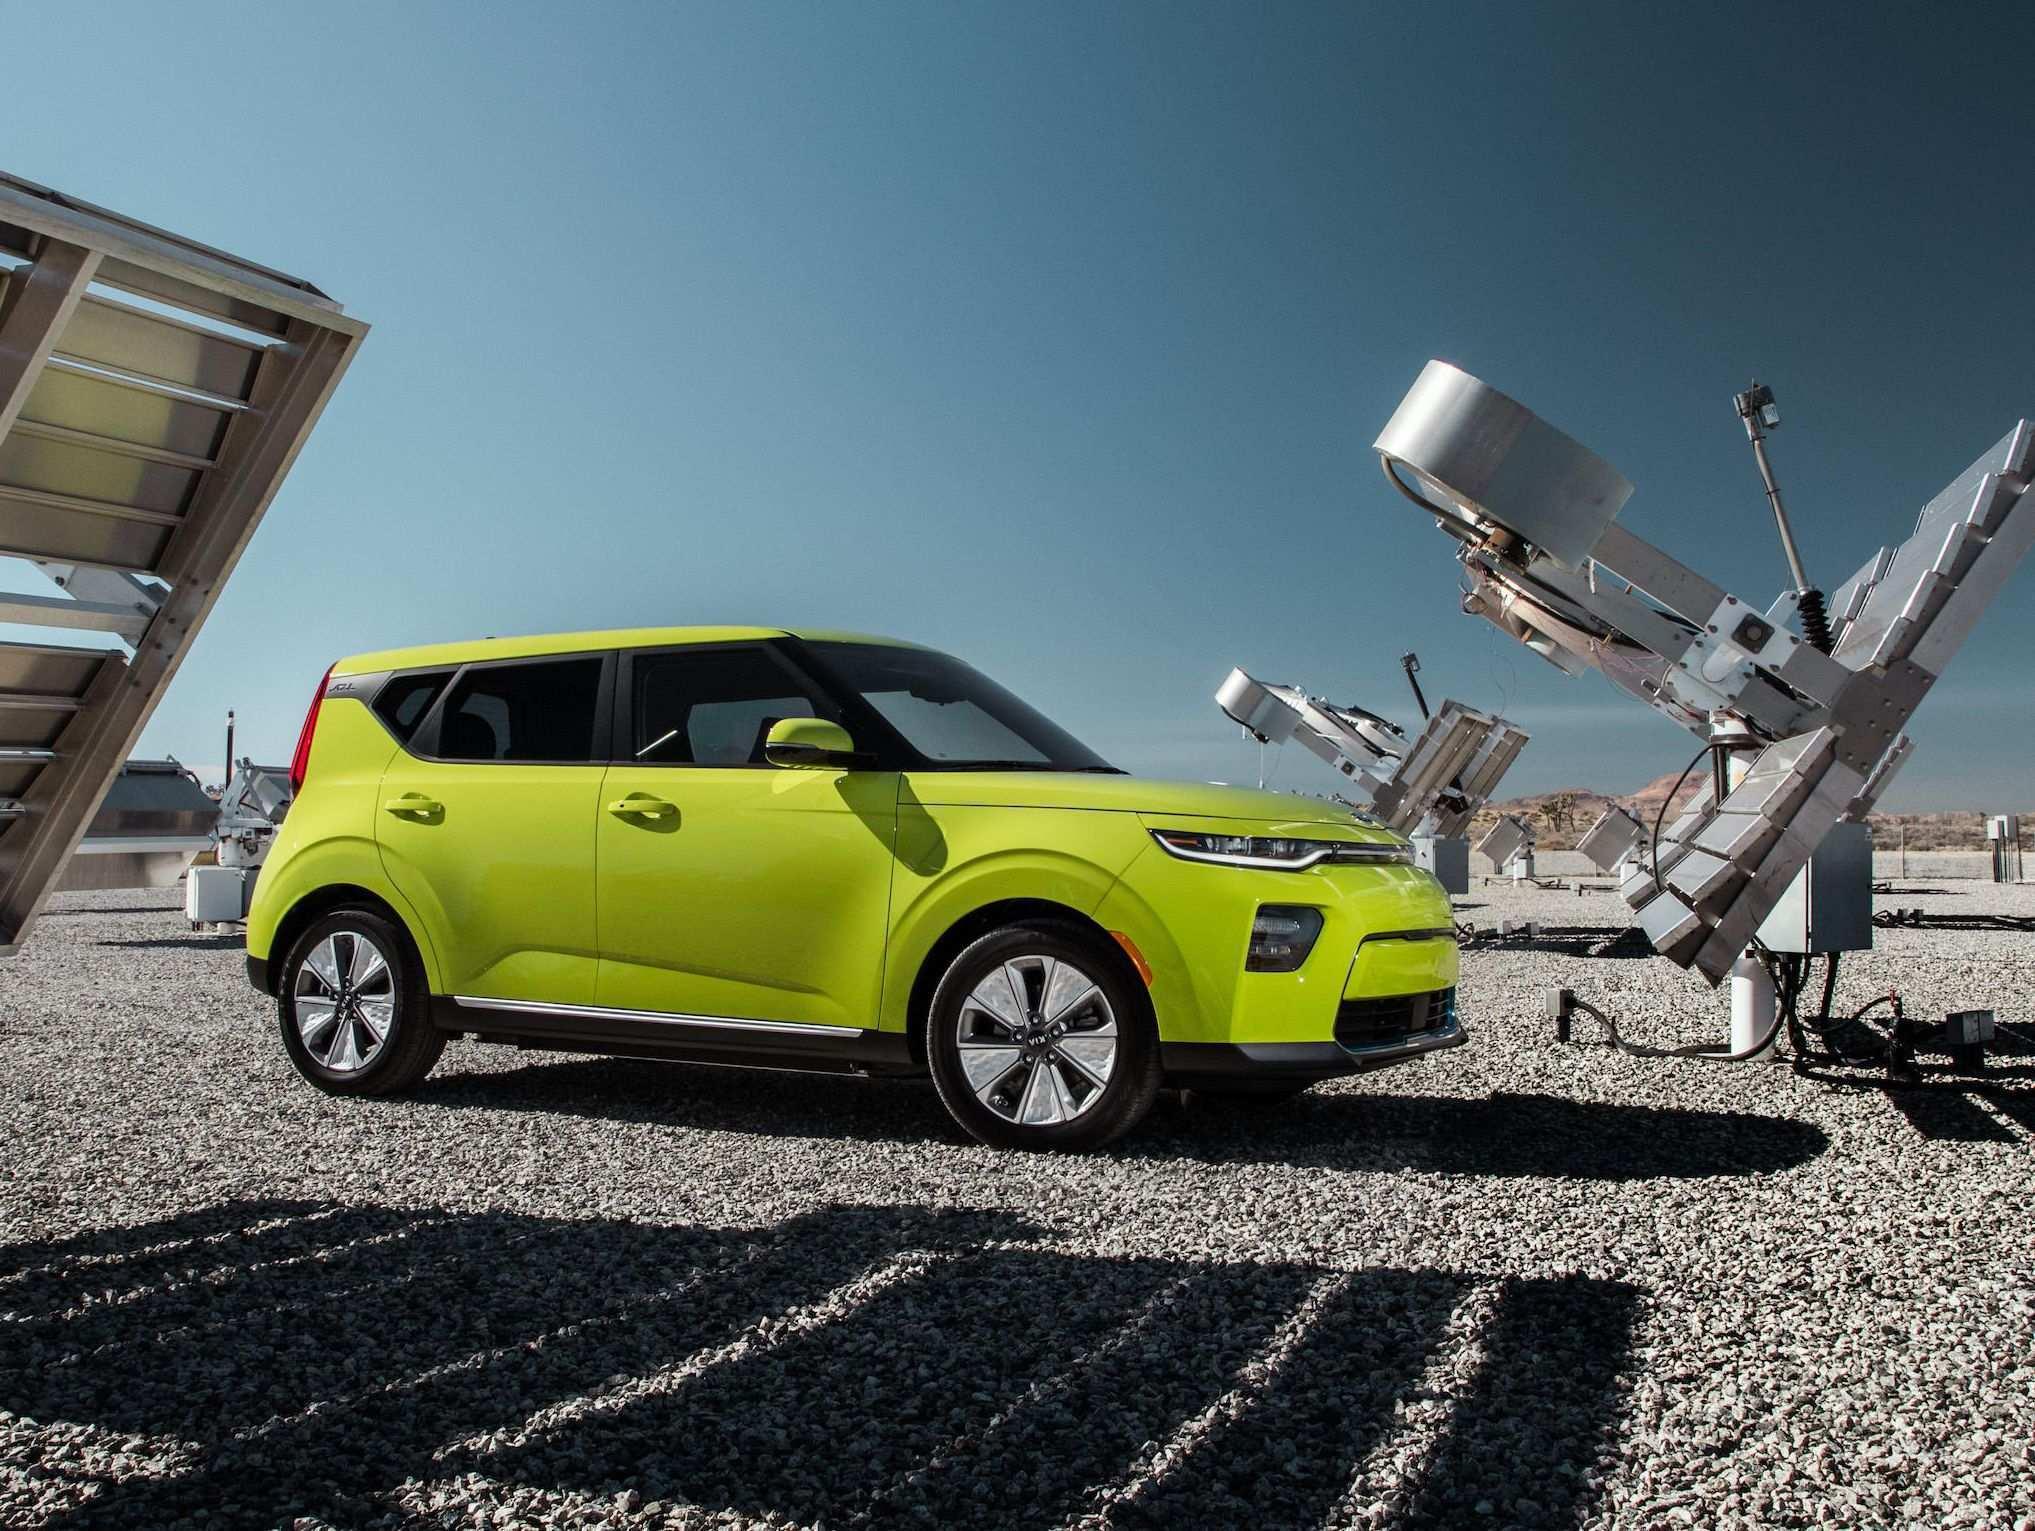 25 All New Kia 2020 Sport Images with Kia 2020 Sport